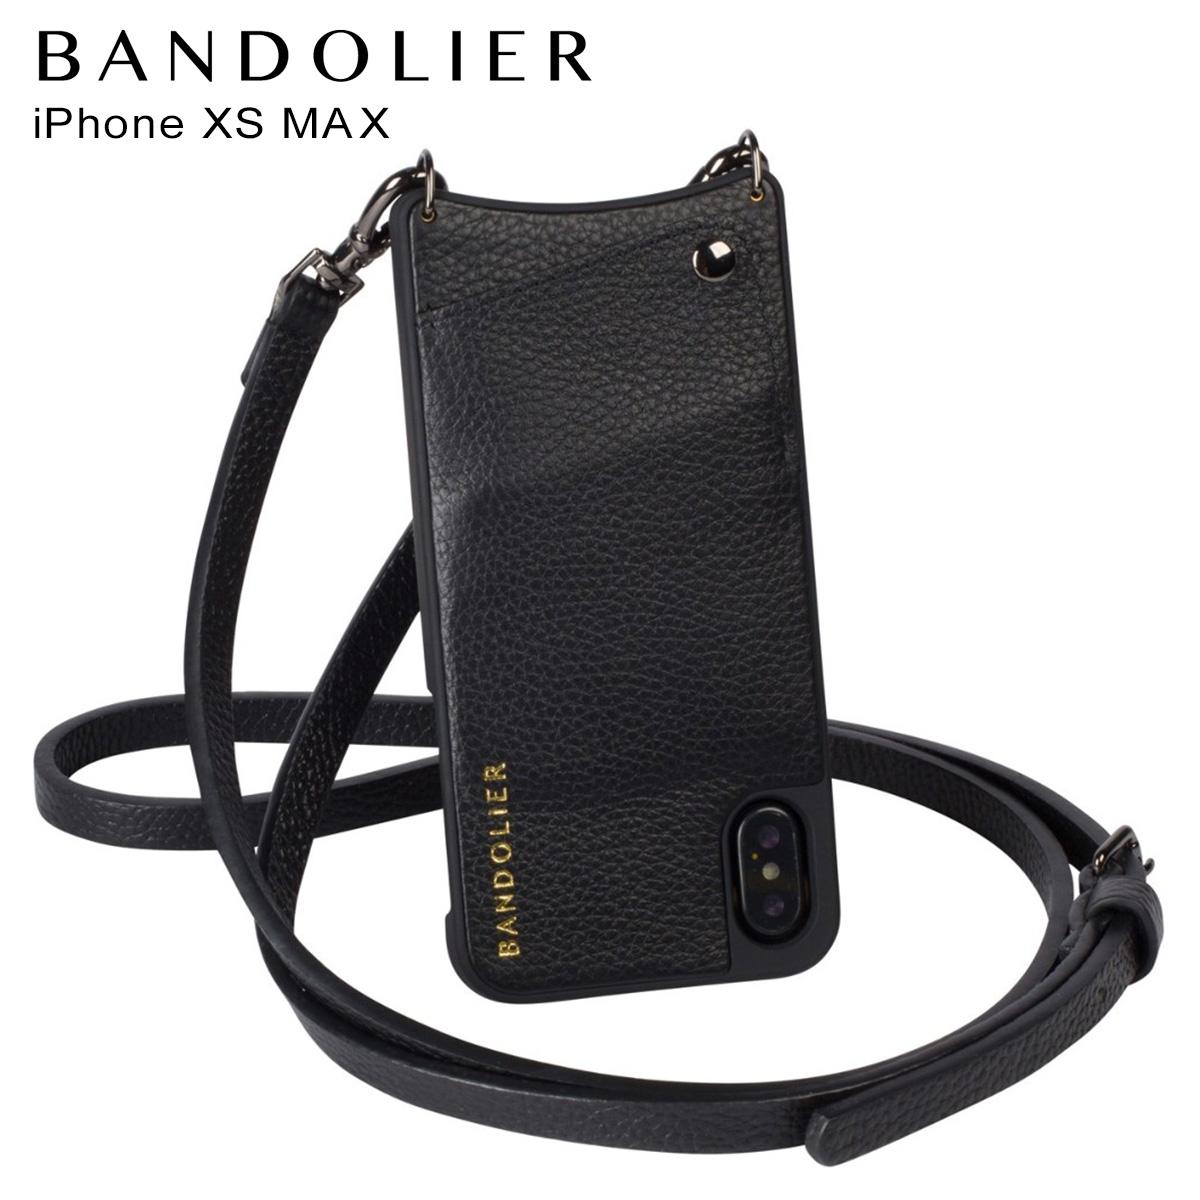 BANDOLIER iPhone XS MAX EMMA PEWTER バンドリヤー ケース ショルダー スマホ アイフォン レザー メンズ レディース ブラック 10EMM1001 [予約商品 4月下旬頃入荷予定 再入荷]